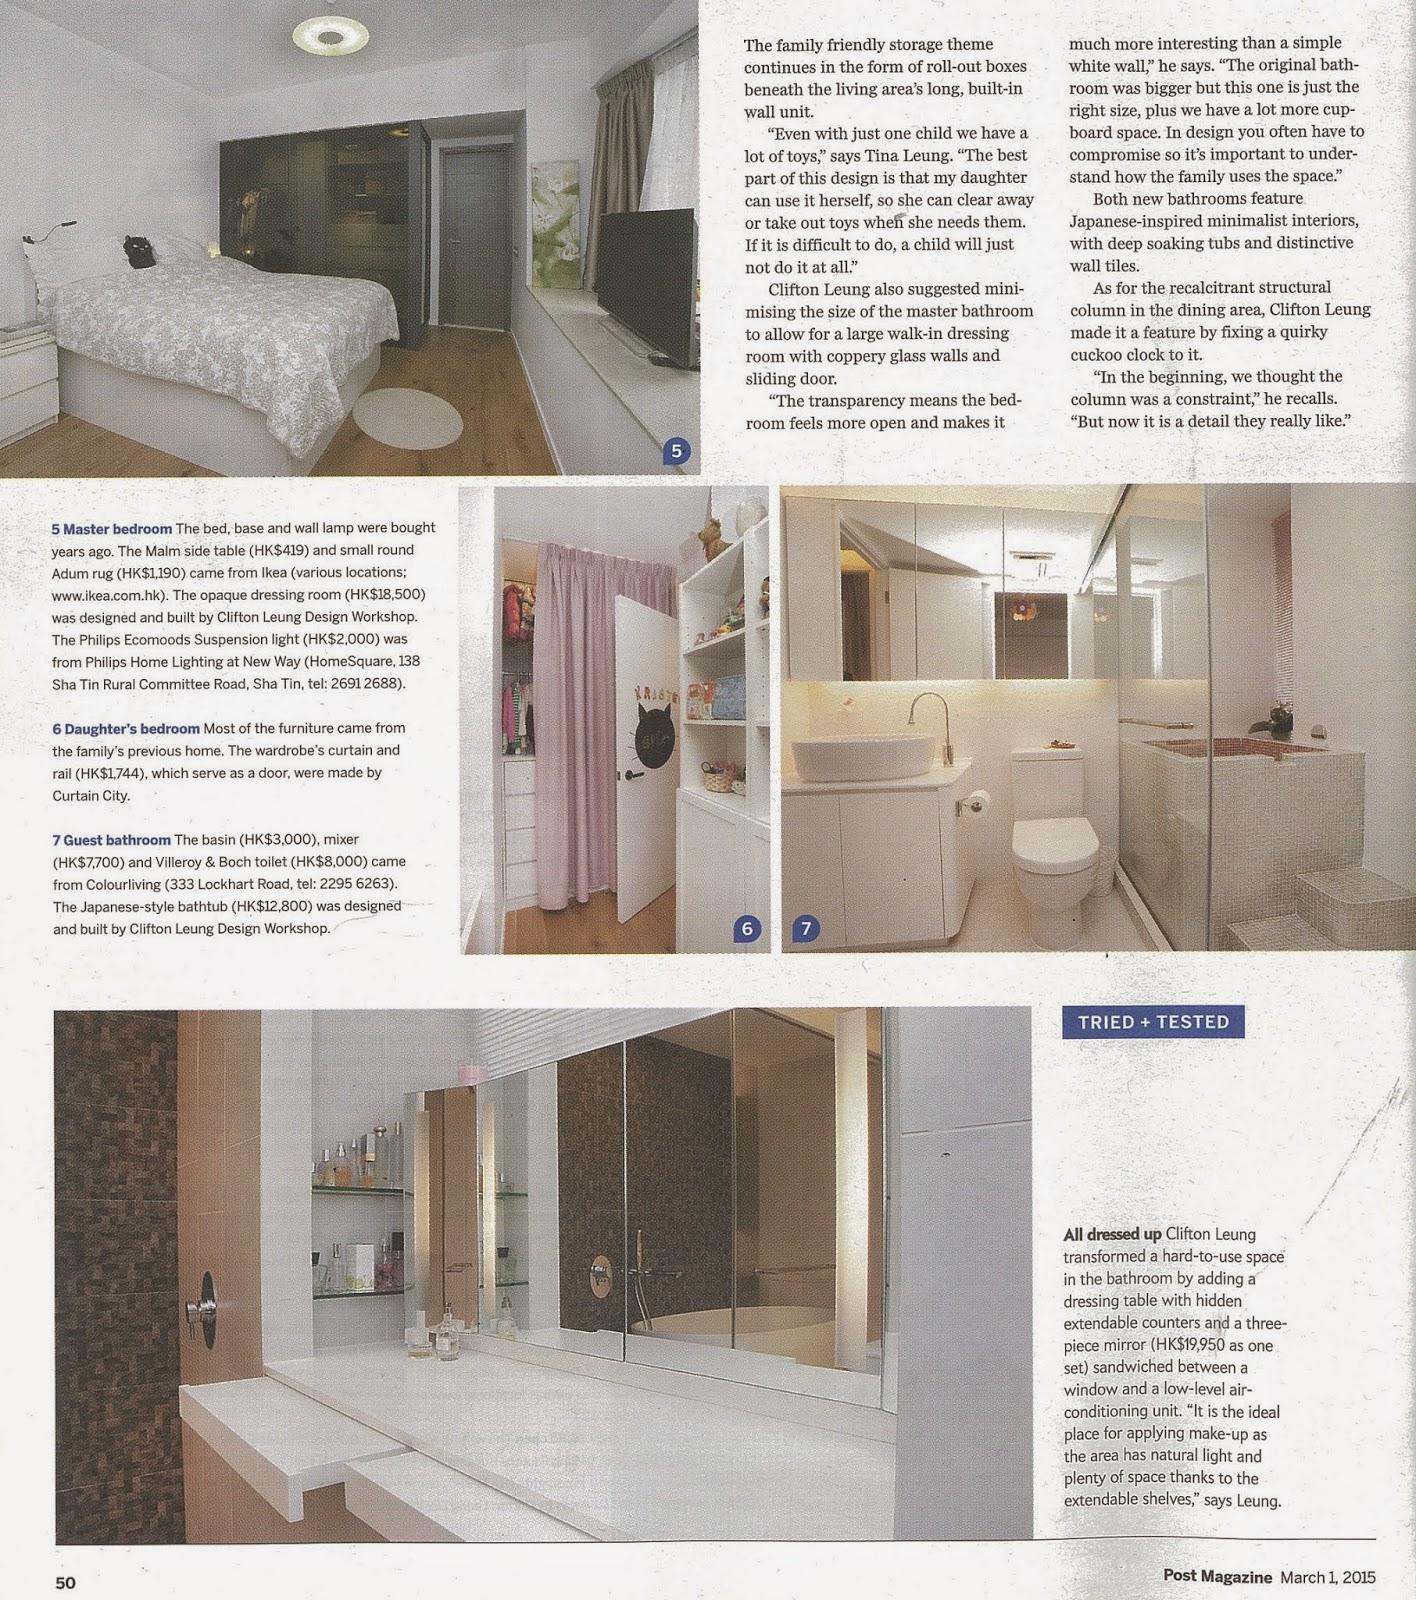 hong kong interior design tips u0026 ideas clifton leung tregunter